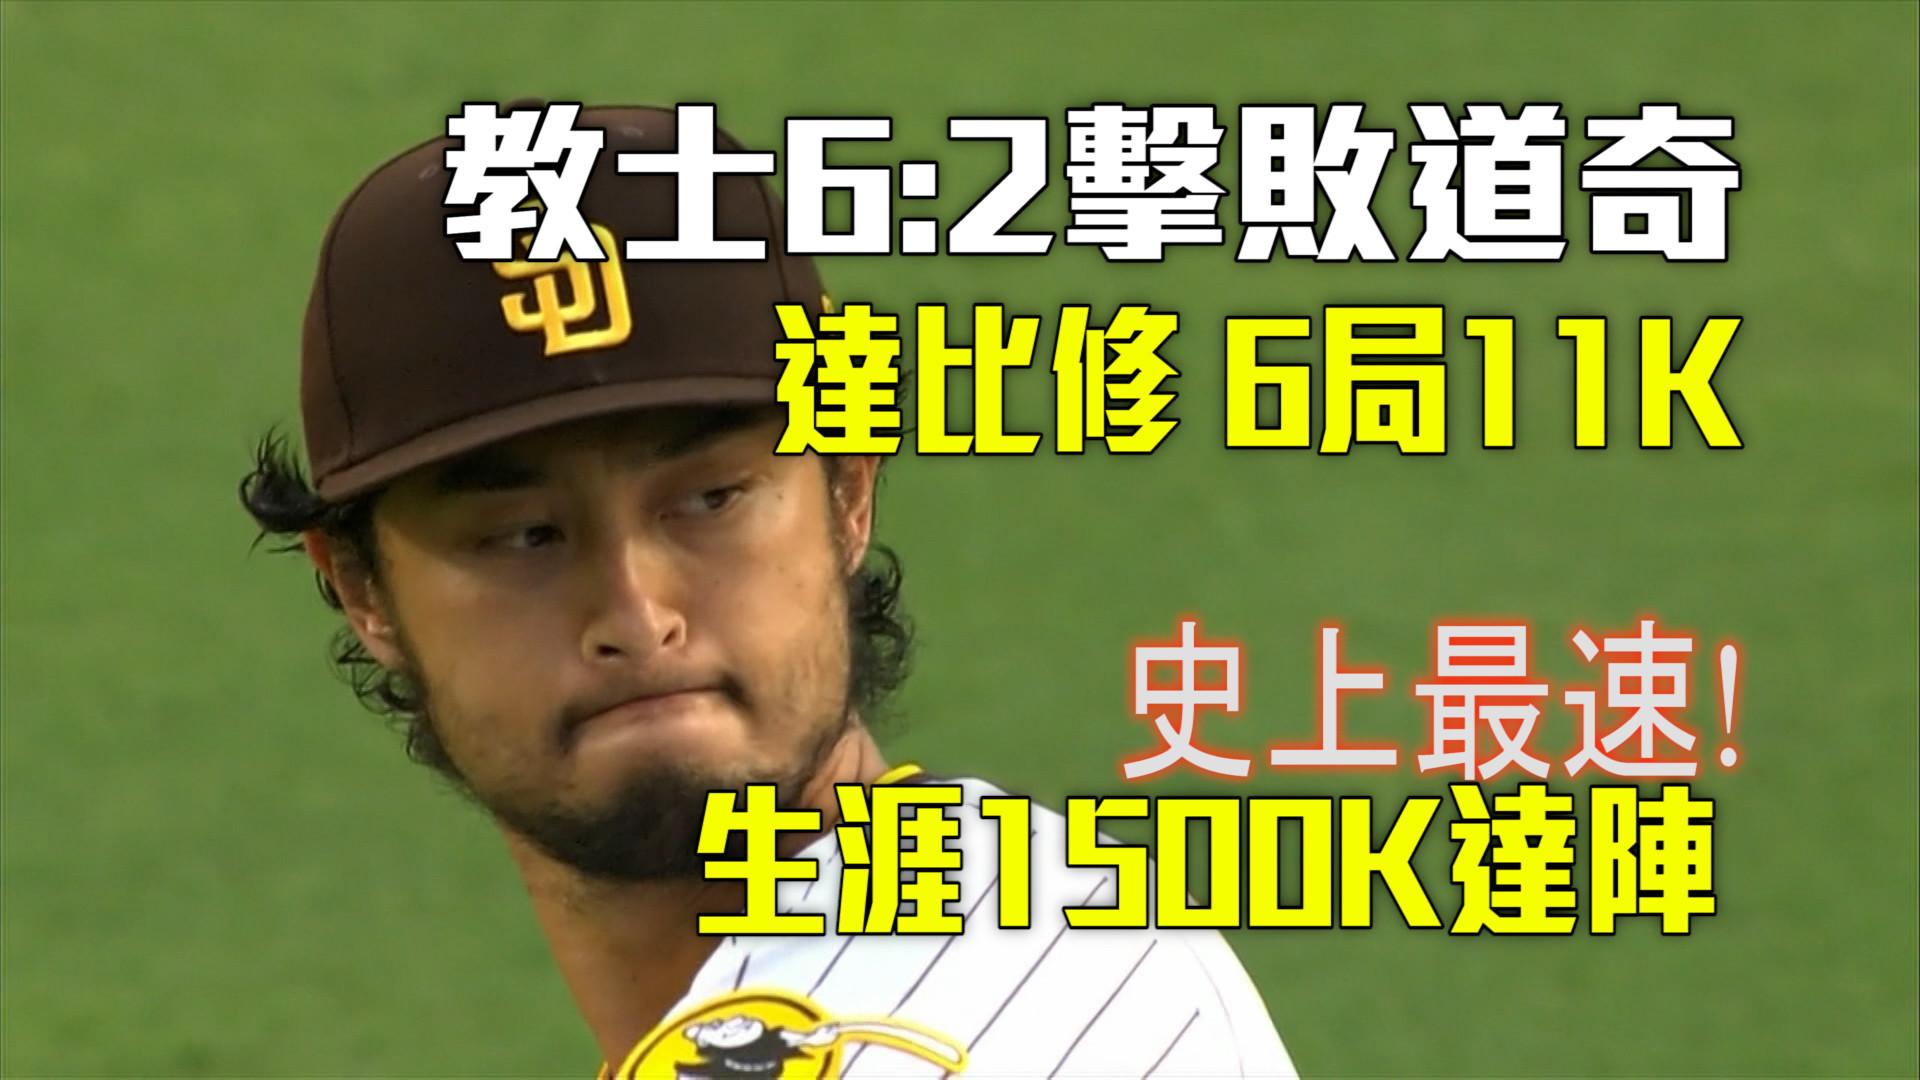 【MLB看愛爾達】達比修達成1500K 教士6:2擊敗道奇 06/22